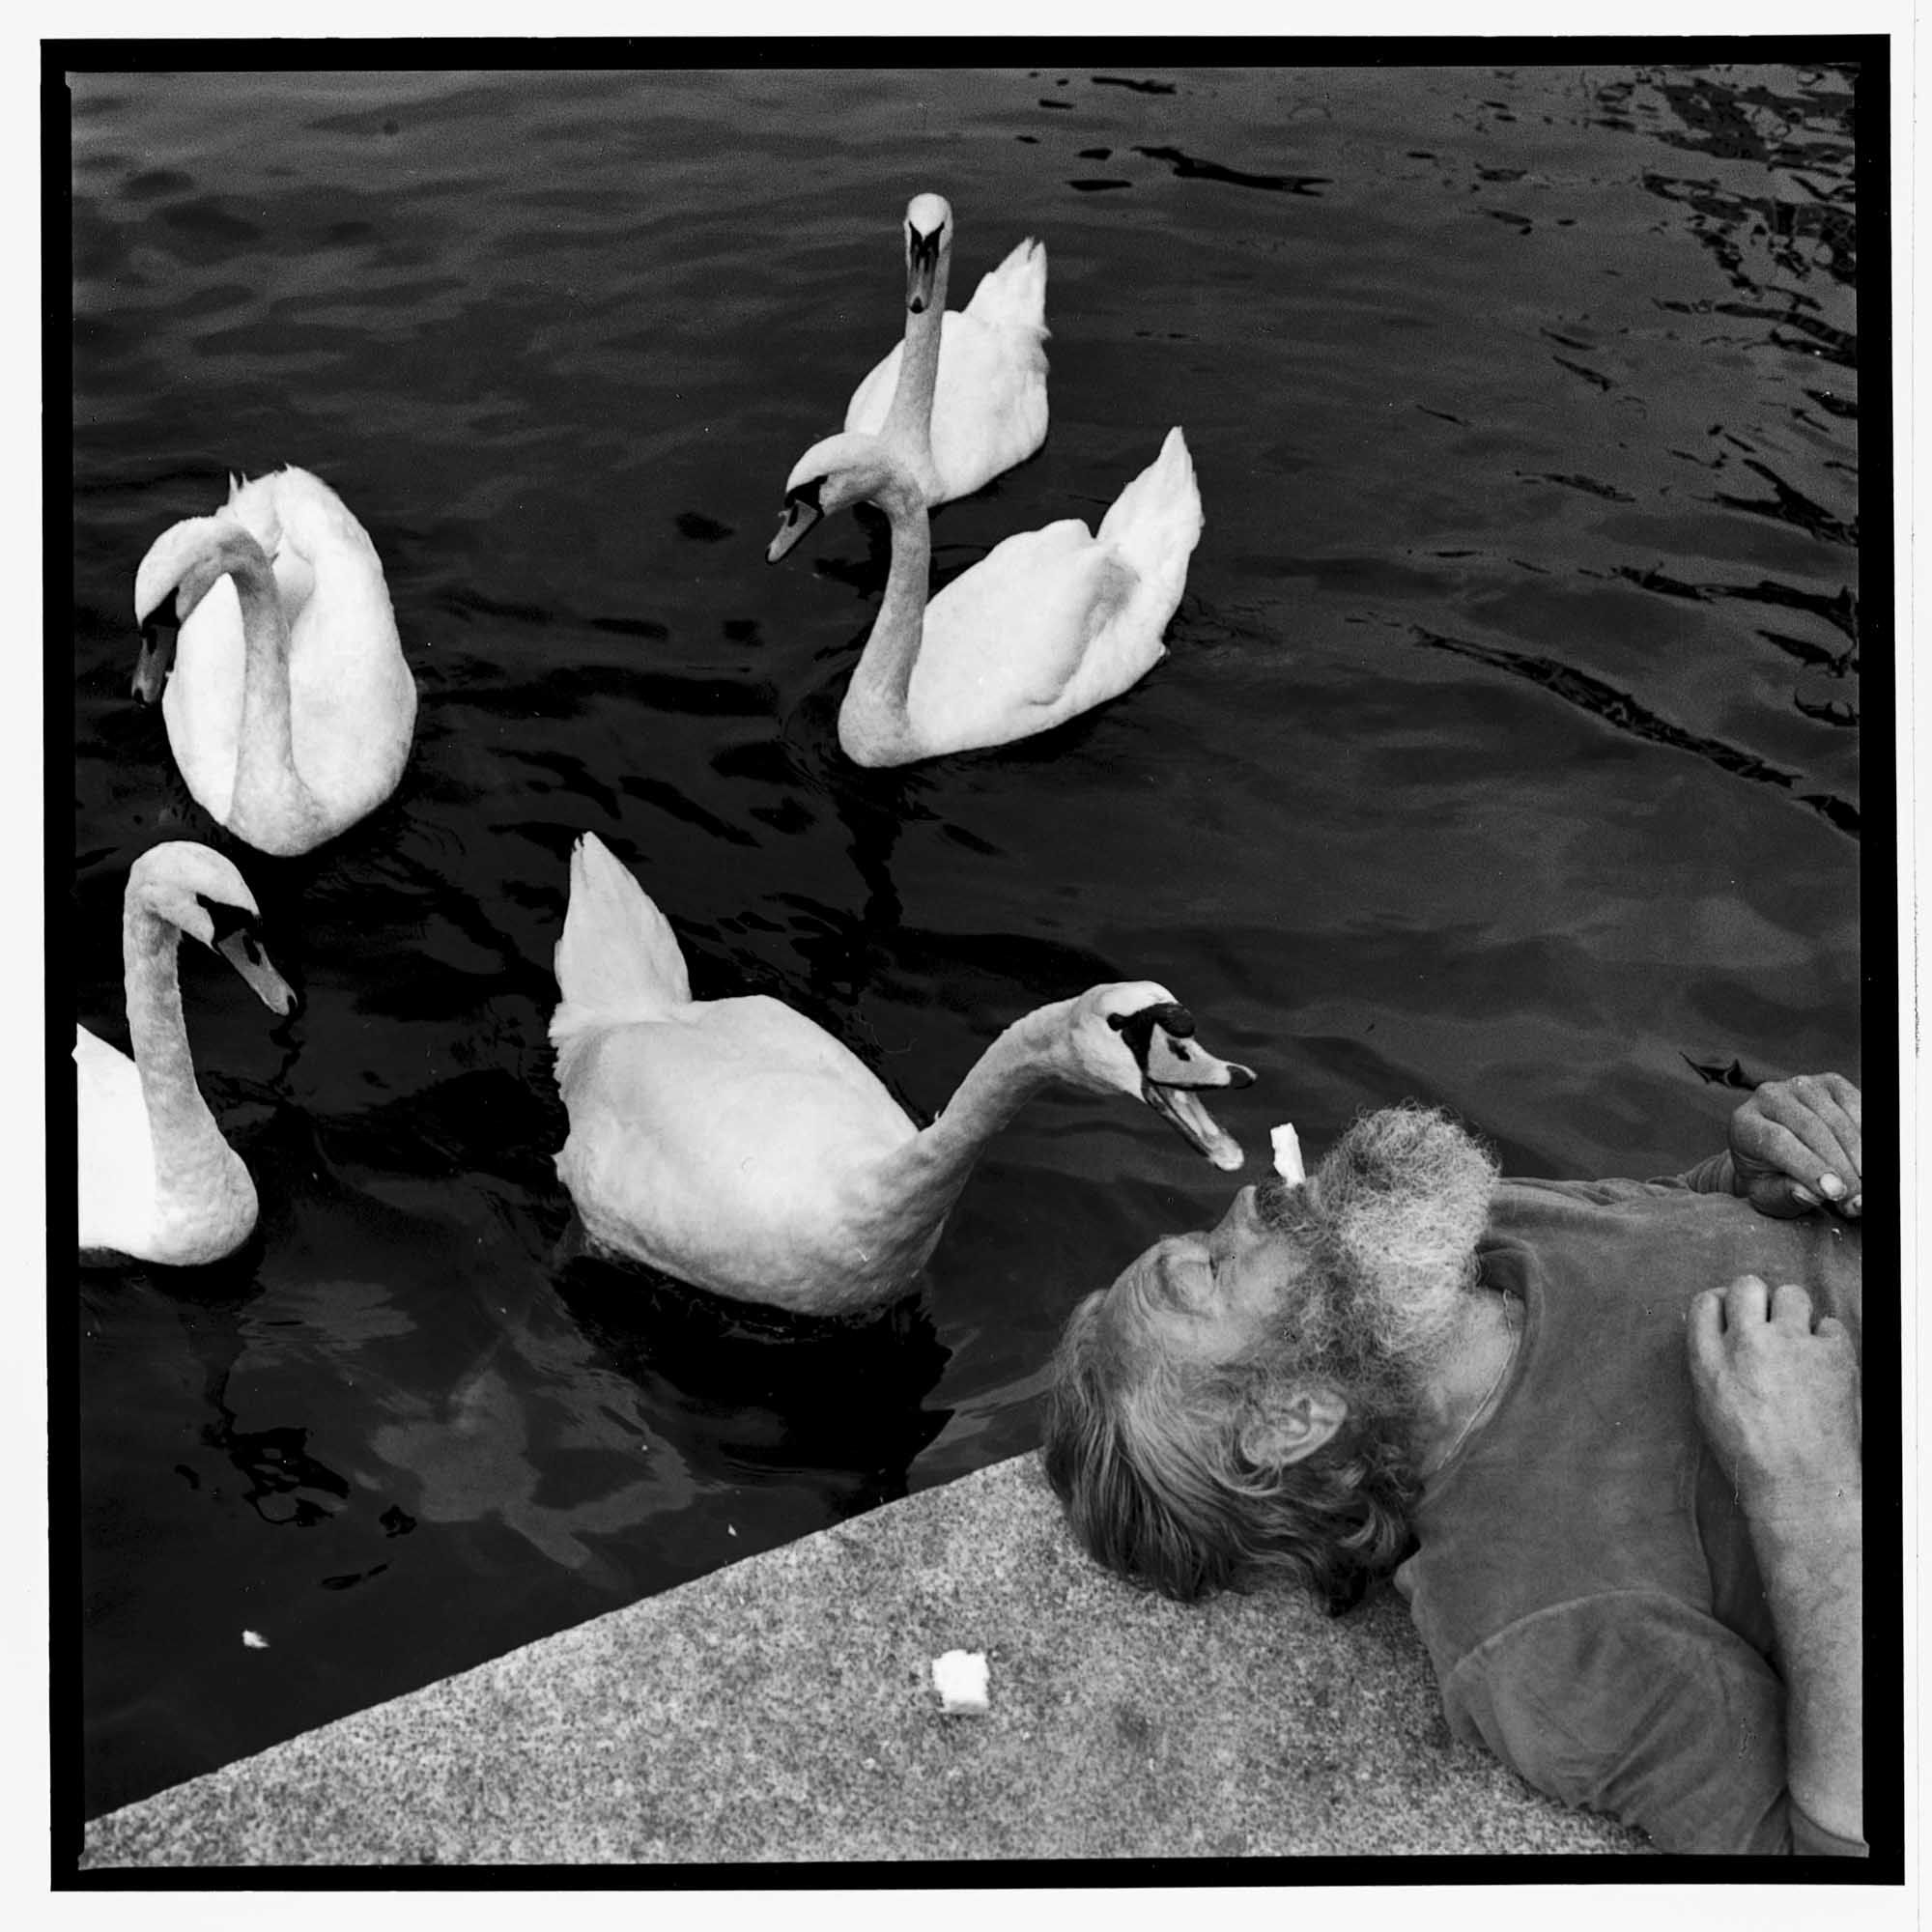 WilliamHeydt-Photographs-C3437-12.jpg